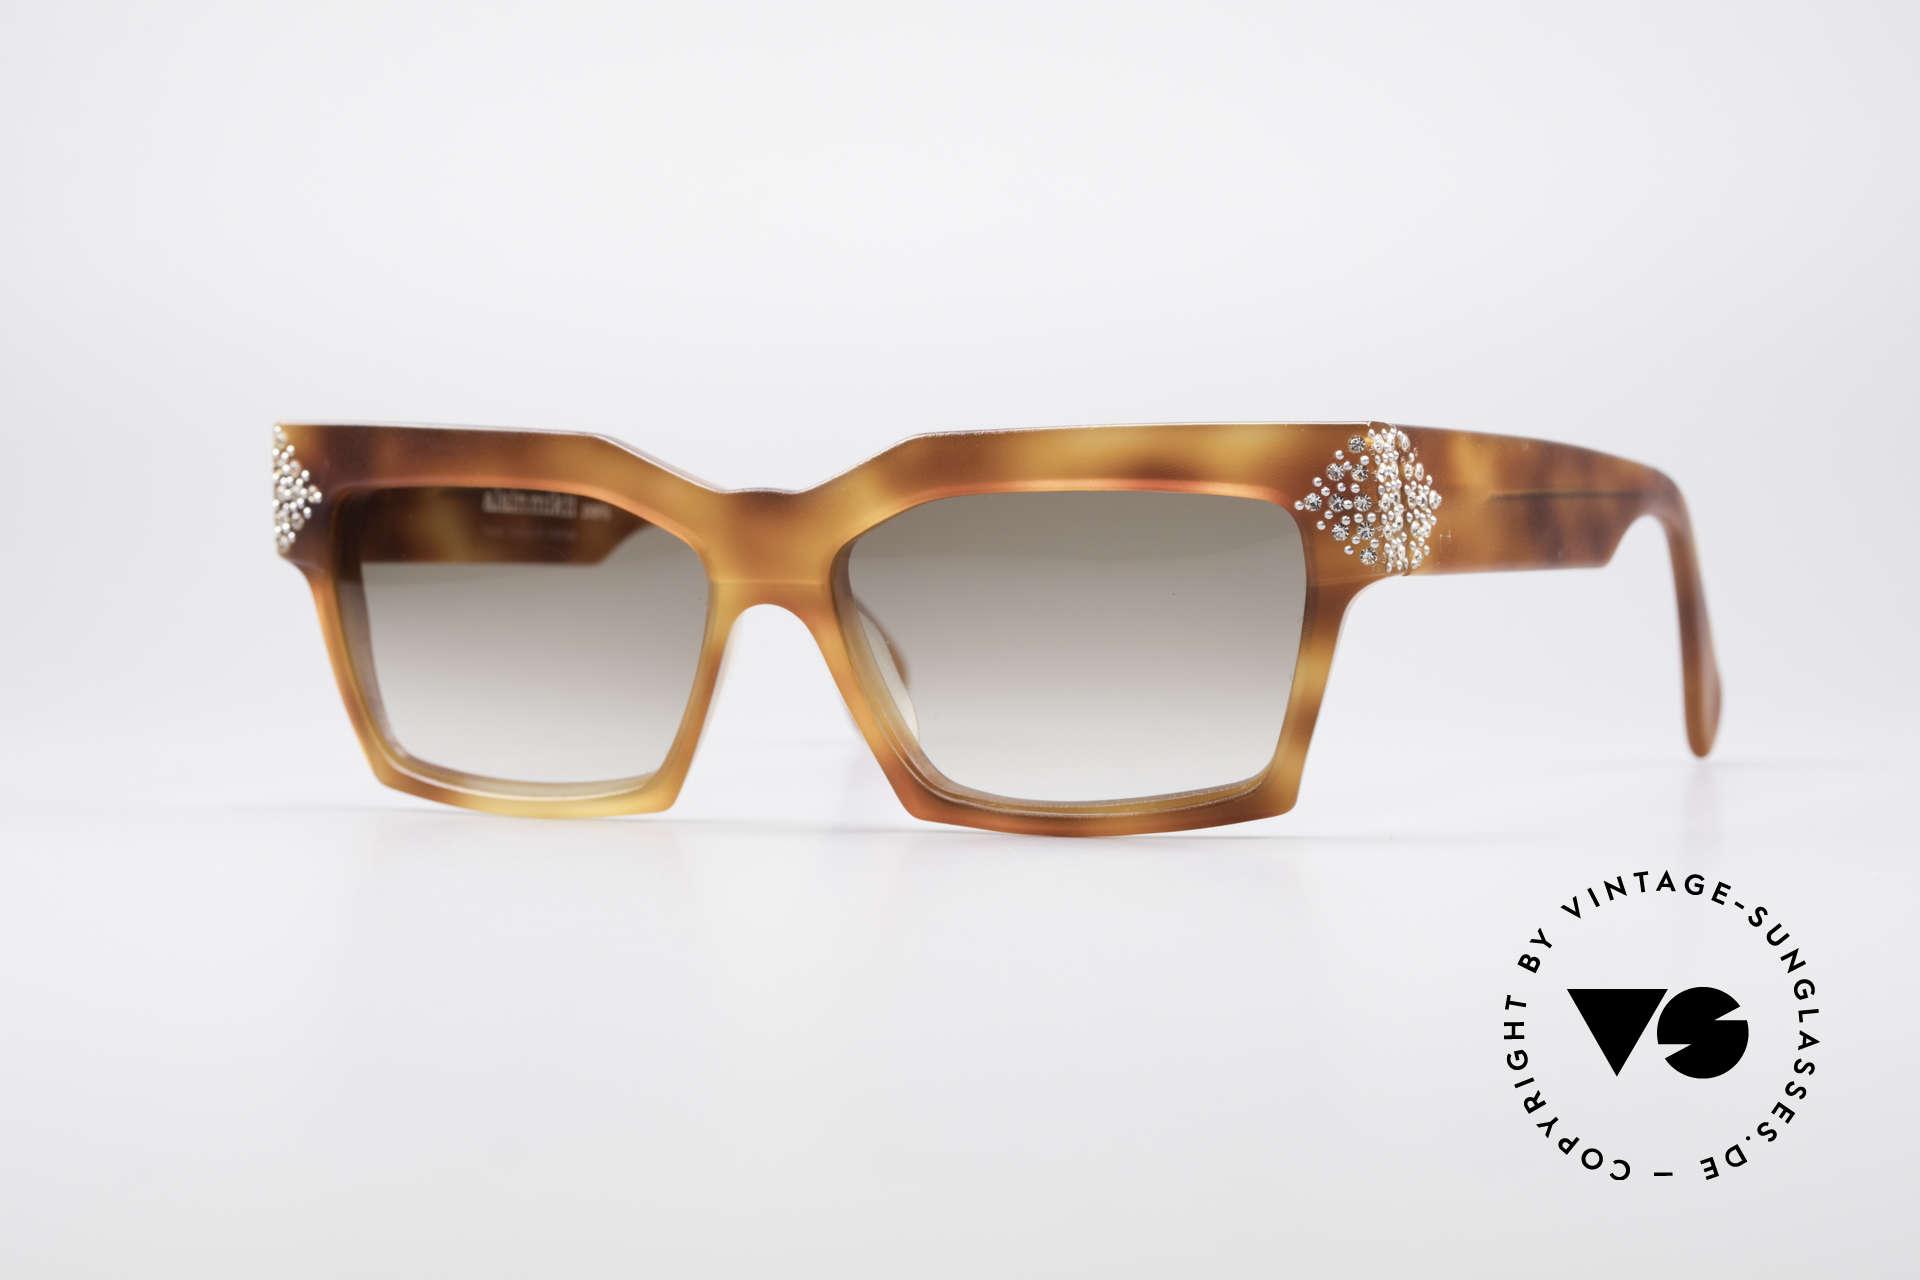 Alain Mikli 318 / 053 80's Gem Designer Sunglasses, oversized french designer sunglasses by ALAIN MIKLI, Made for Women